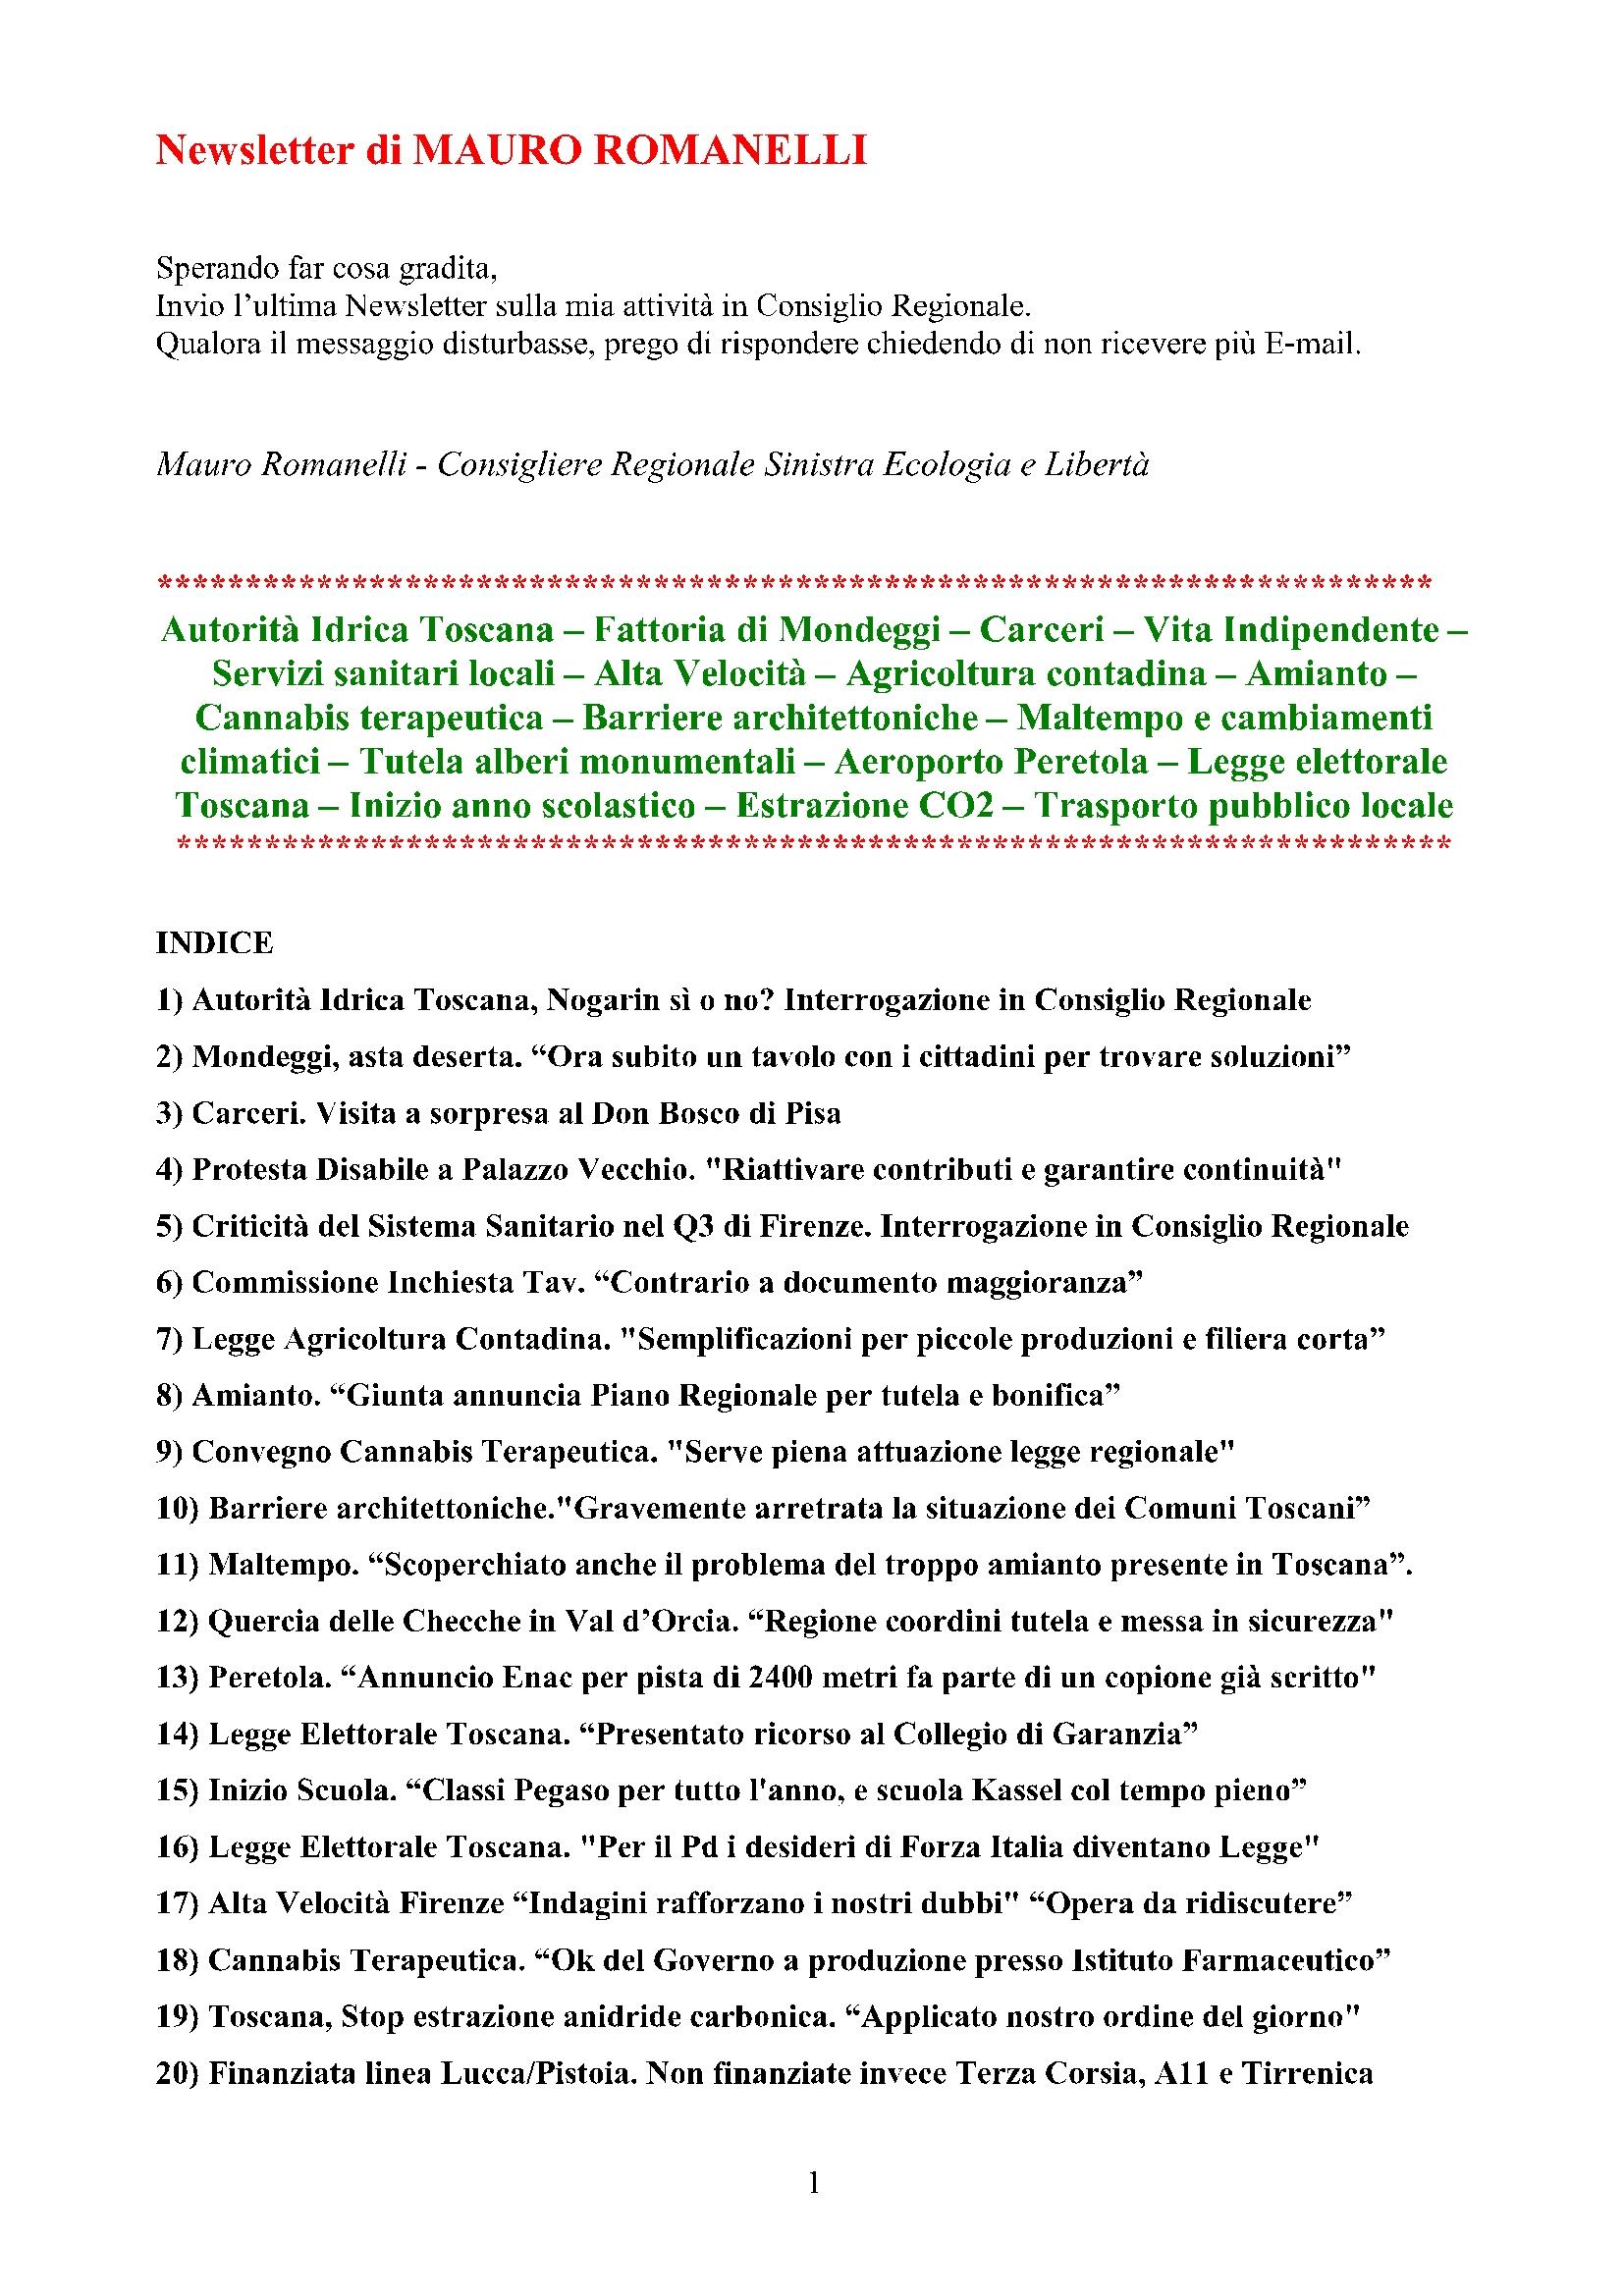 Newsletter di MAURO ROMANELLI Ottobre 2014